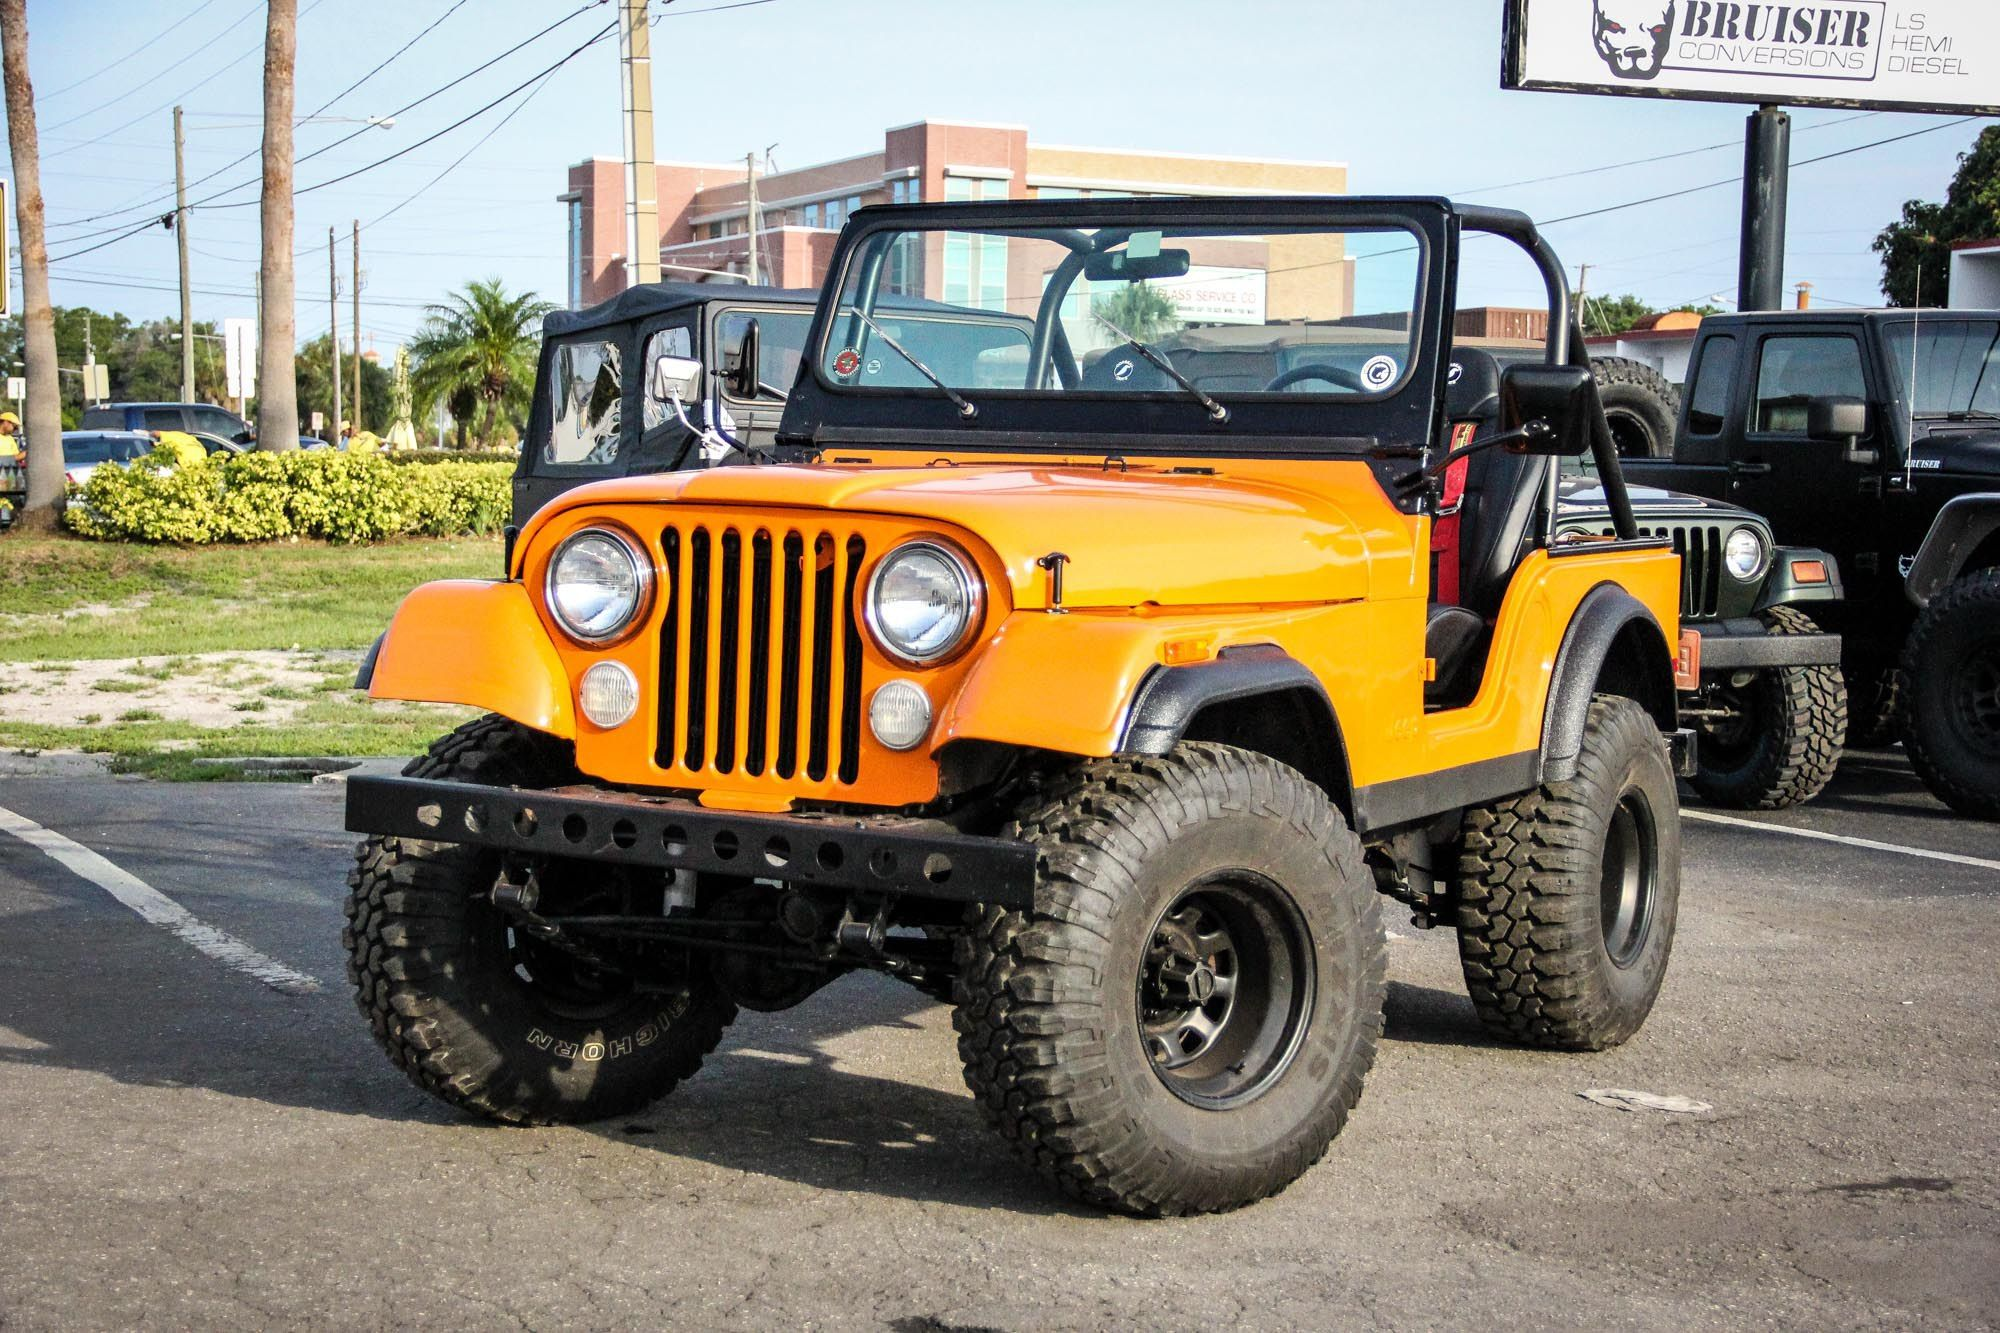 jeep wrangler cj diesel conversion jeep life pinterest jeeps diesel and jeep cj. Black Bedroom Furniture Sets. Home Design Ideas